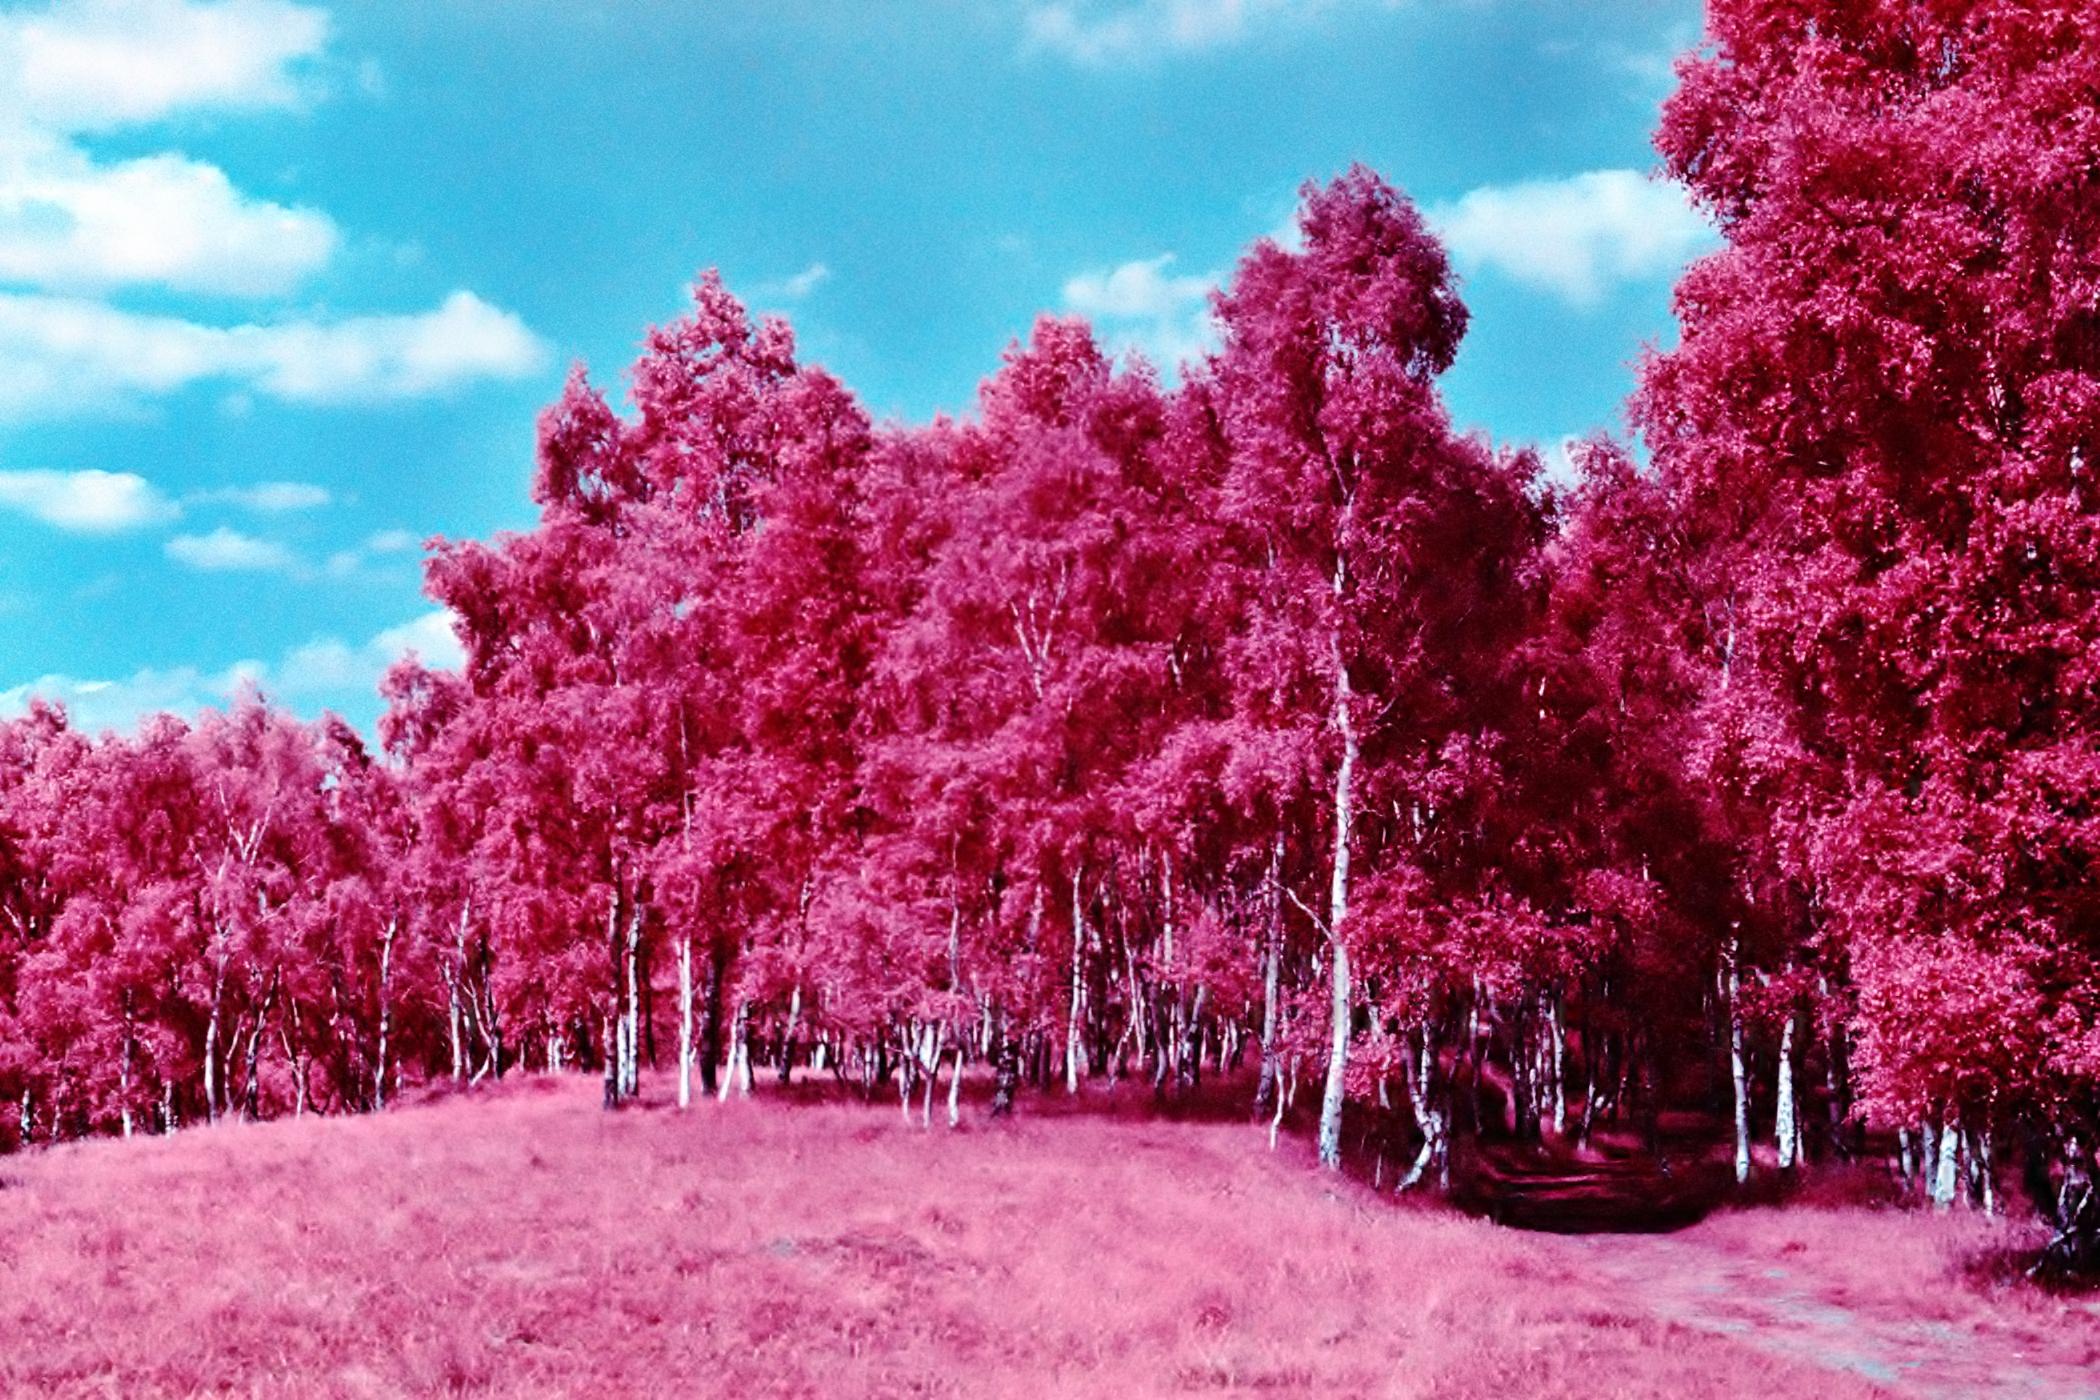 Bubblegum Trees | Colour IR | Zenit TTL | Lucy Wainwright